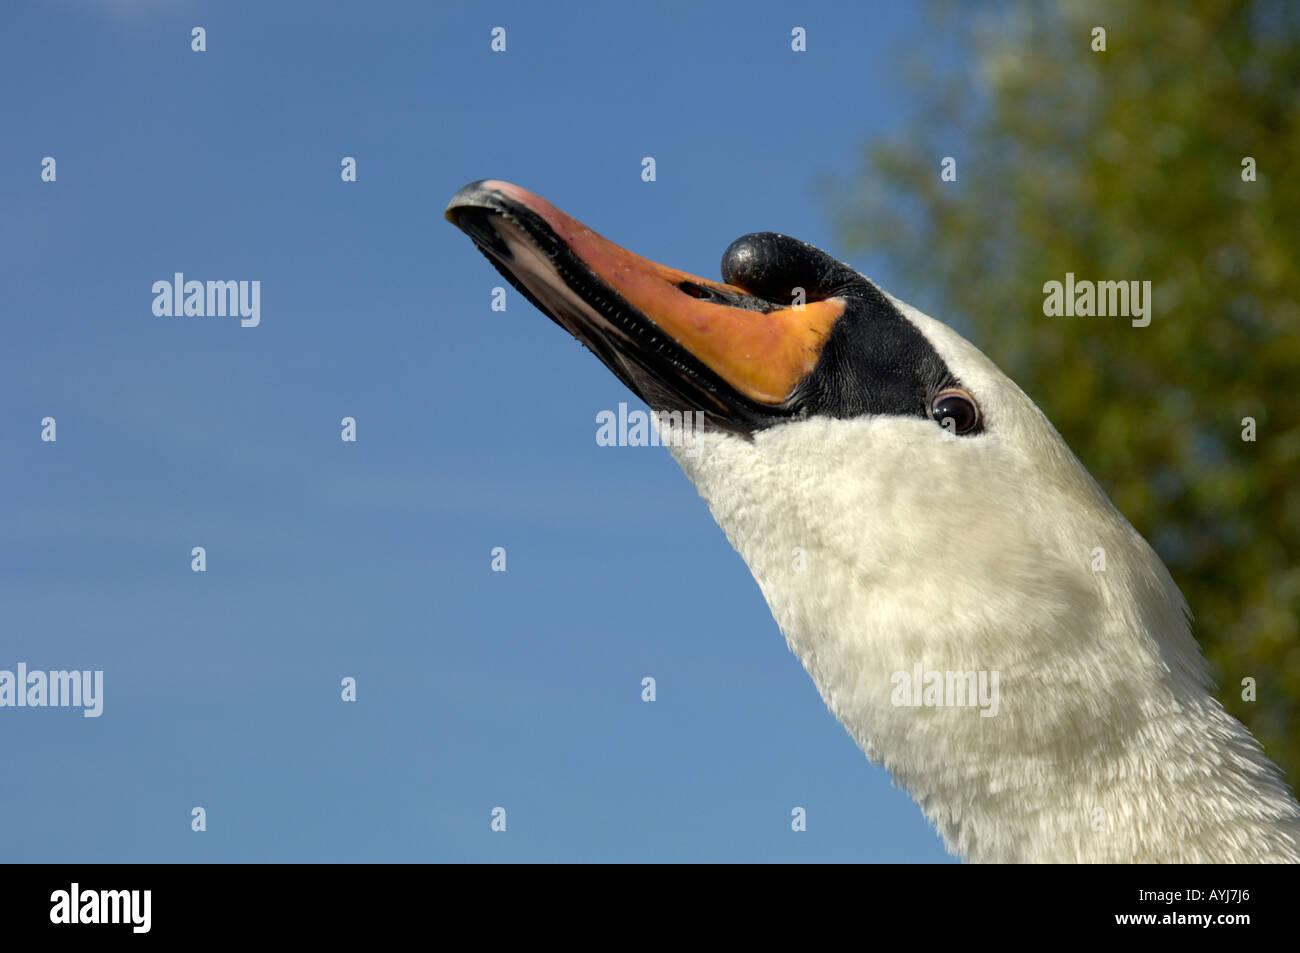 Mute Swan Cygnus olor making grunting sound Oxfordshire UK Stock